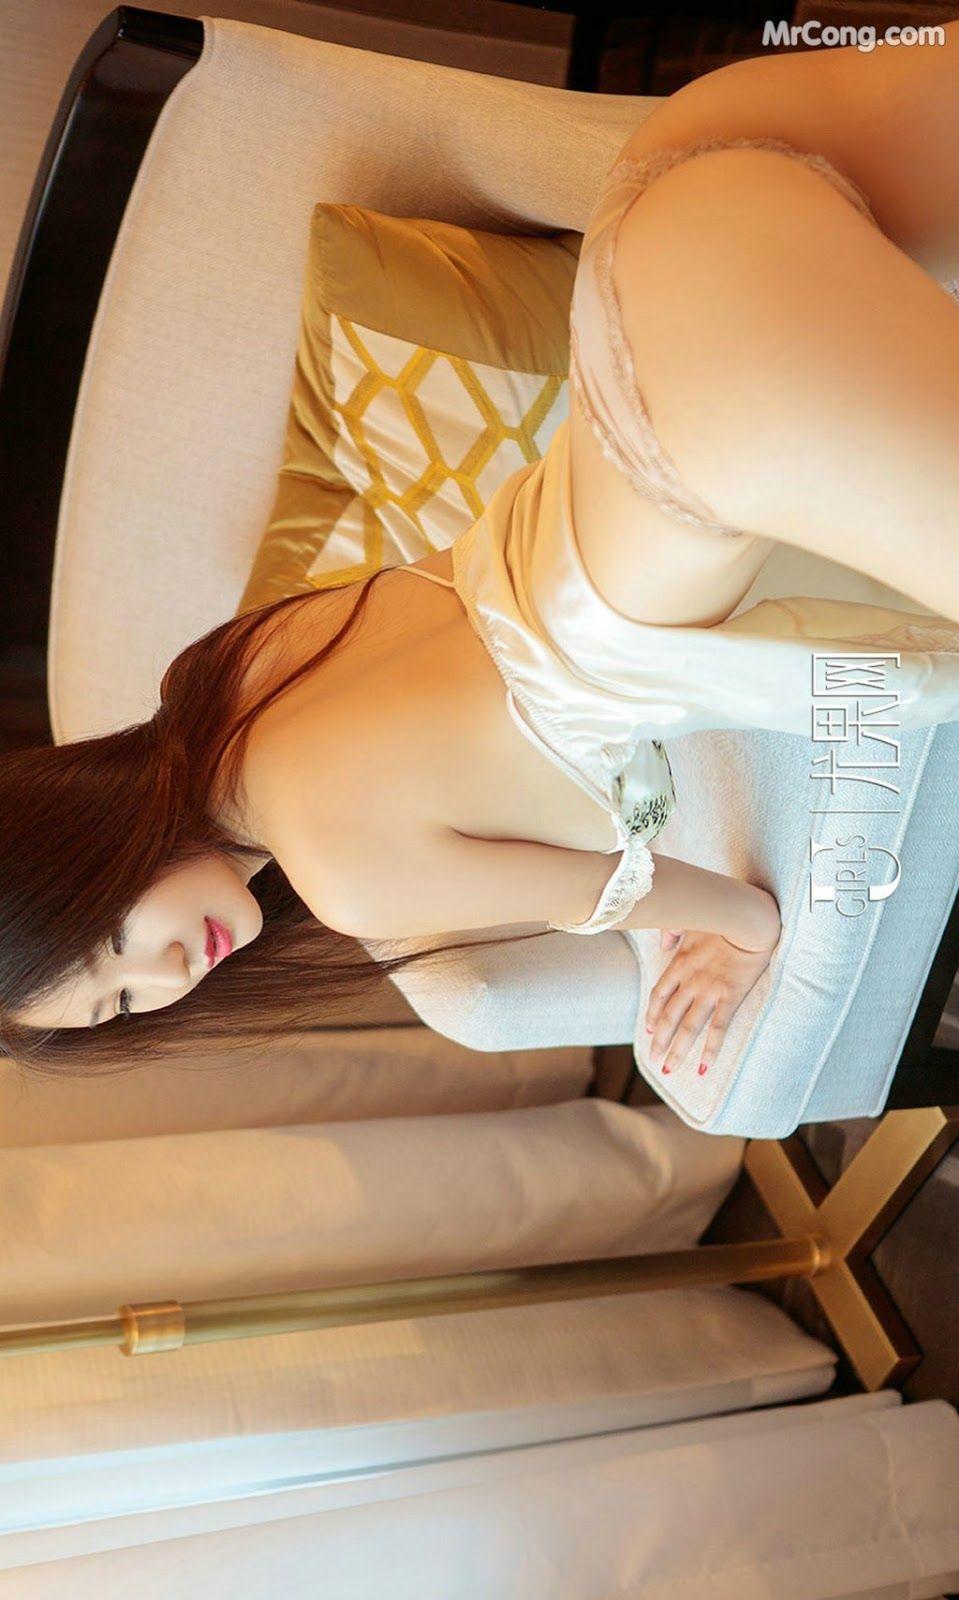 thai girls wildsejin makemodel nude ugirlsヌード UGIRLS – Ai You Wu App No.837: Người mẫu Jing Mei